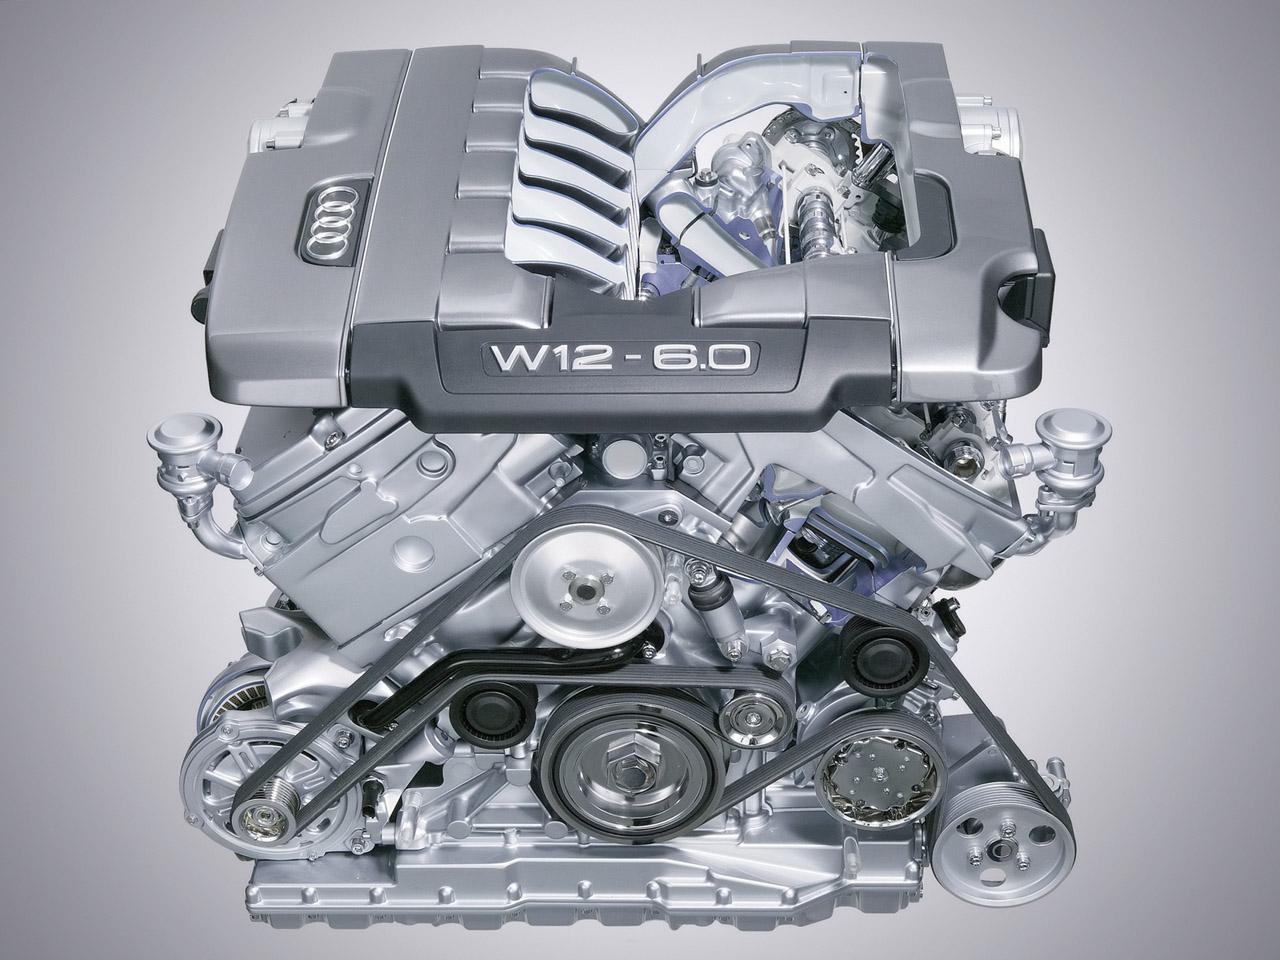 hight resolution of audi a8l engine diagram wiring diagram databasewrg 0912 bentley w16 engine diagram audi a8l engine